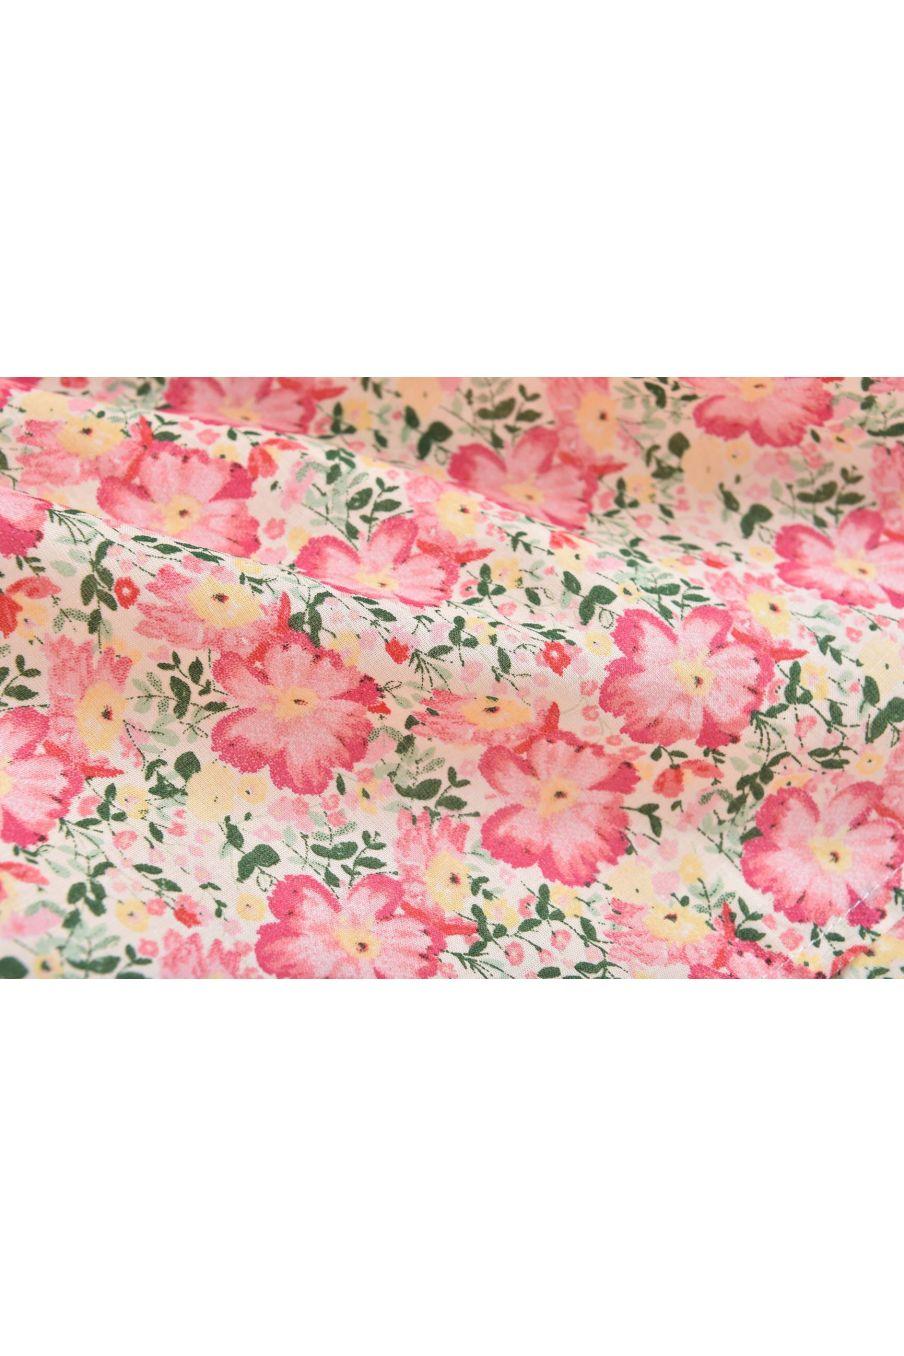 bohemian chic vintage dress girl christina pink meadow